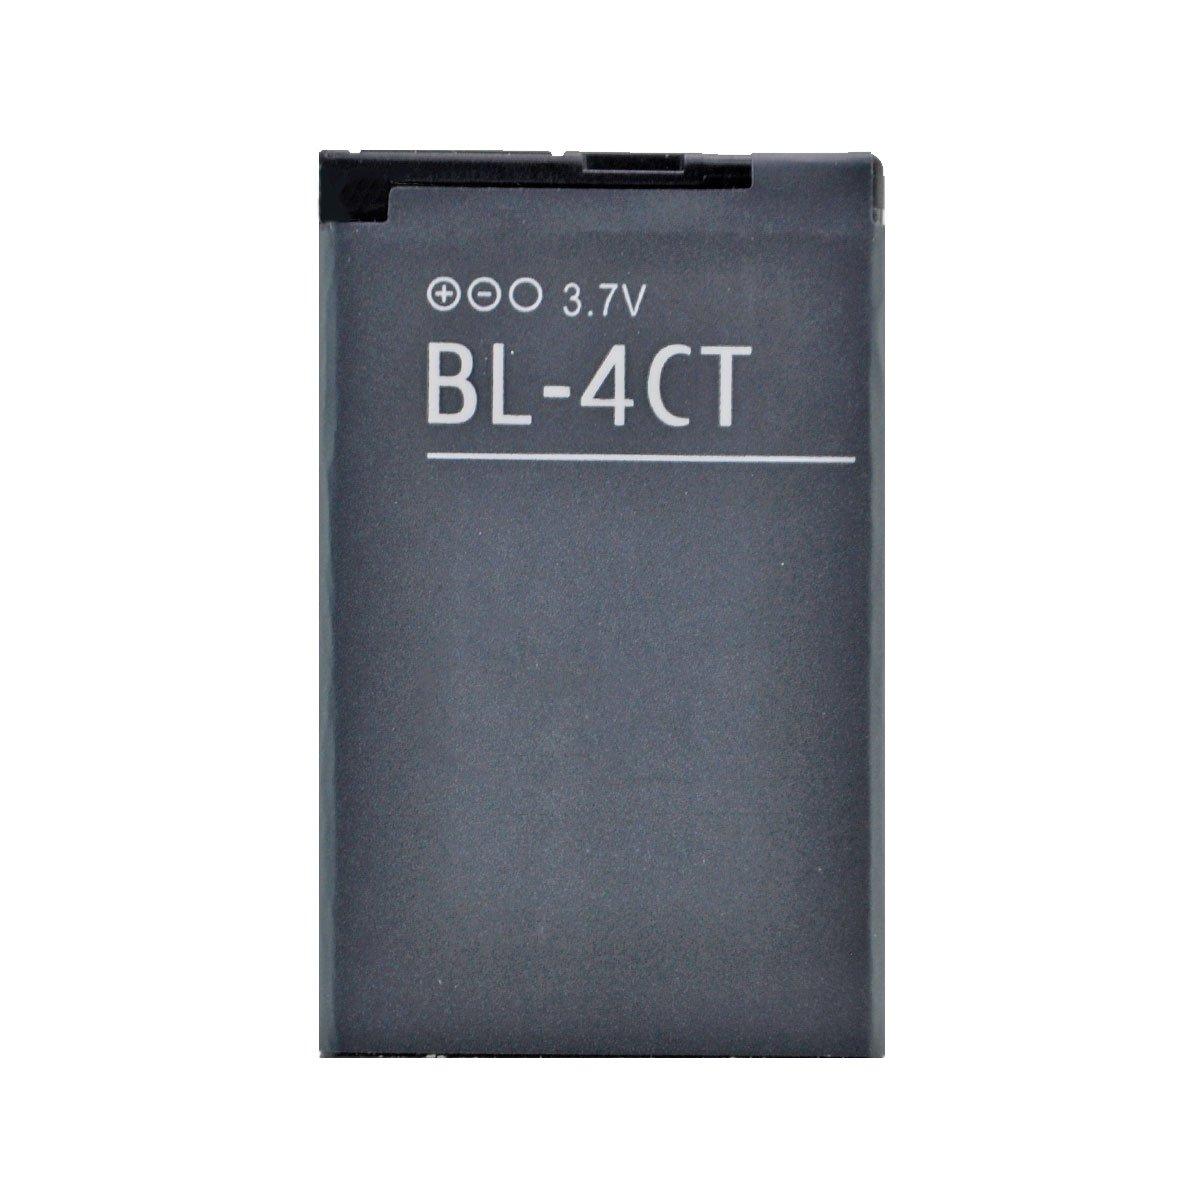 Аккумуляторная батарея для Nokia X3 BL-4CT